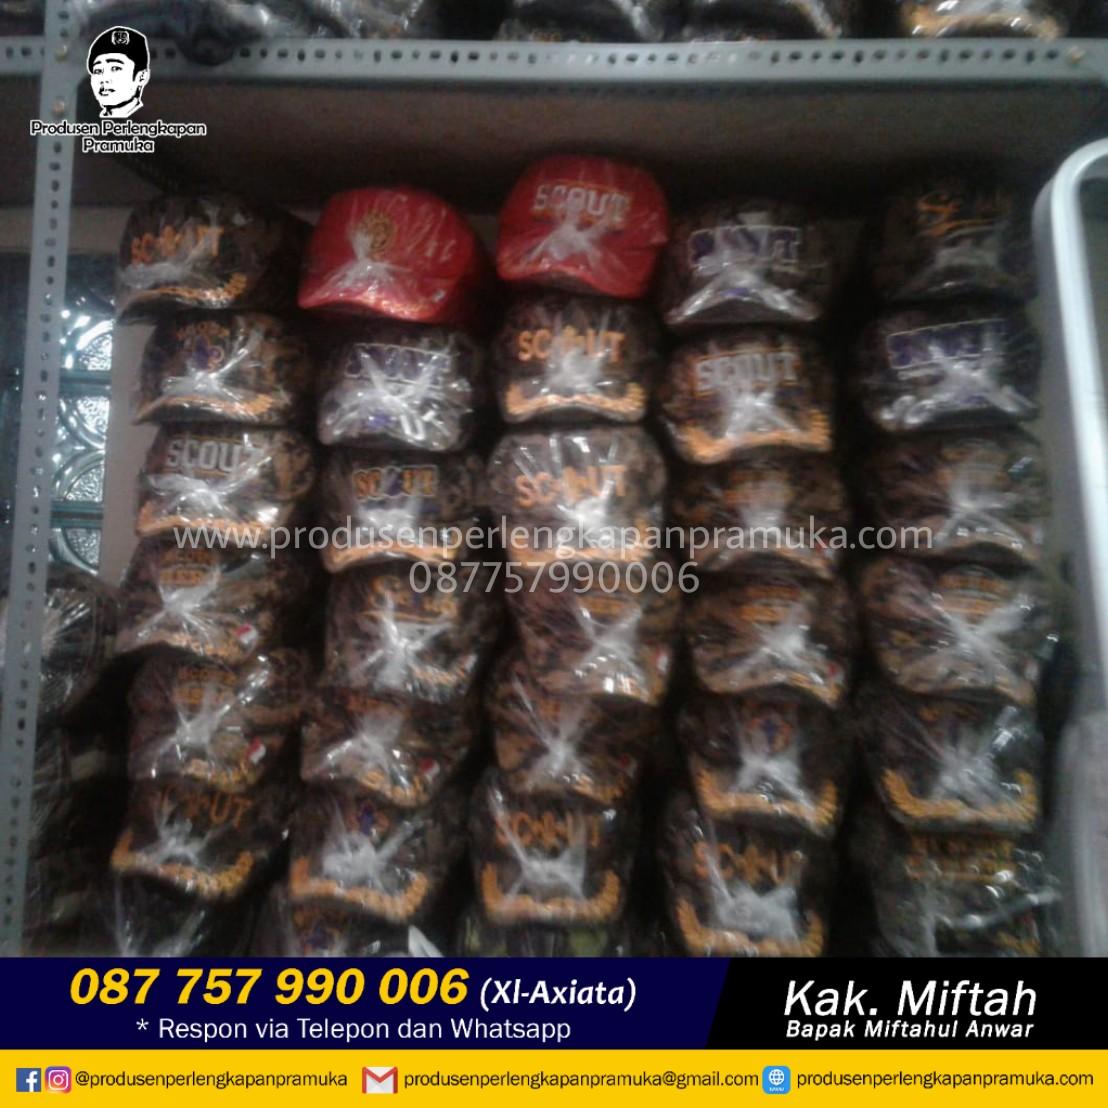 Grosir Topi Surabaya | Jual Topi Surabaya | Produsen Topi Surabaya